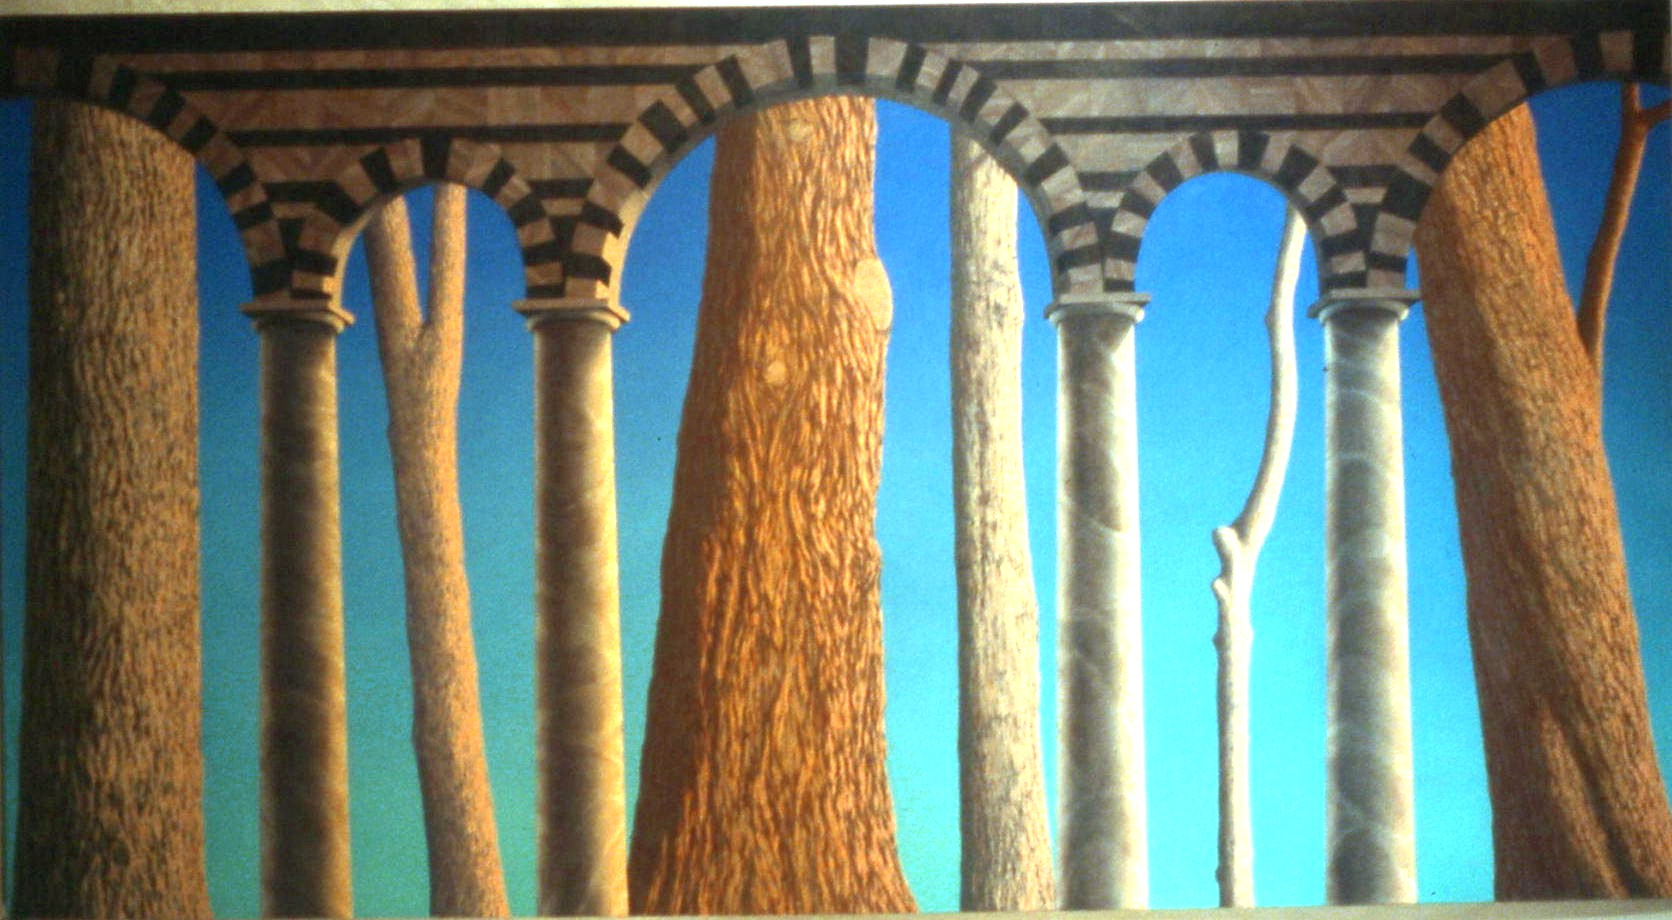 Brian Cesario triumph of western civilisation-oil on canvas-40x70.jpg